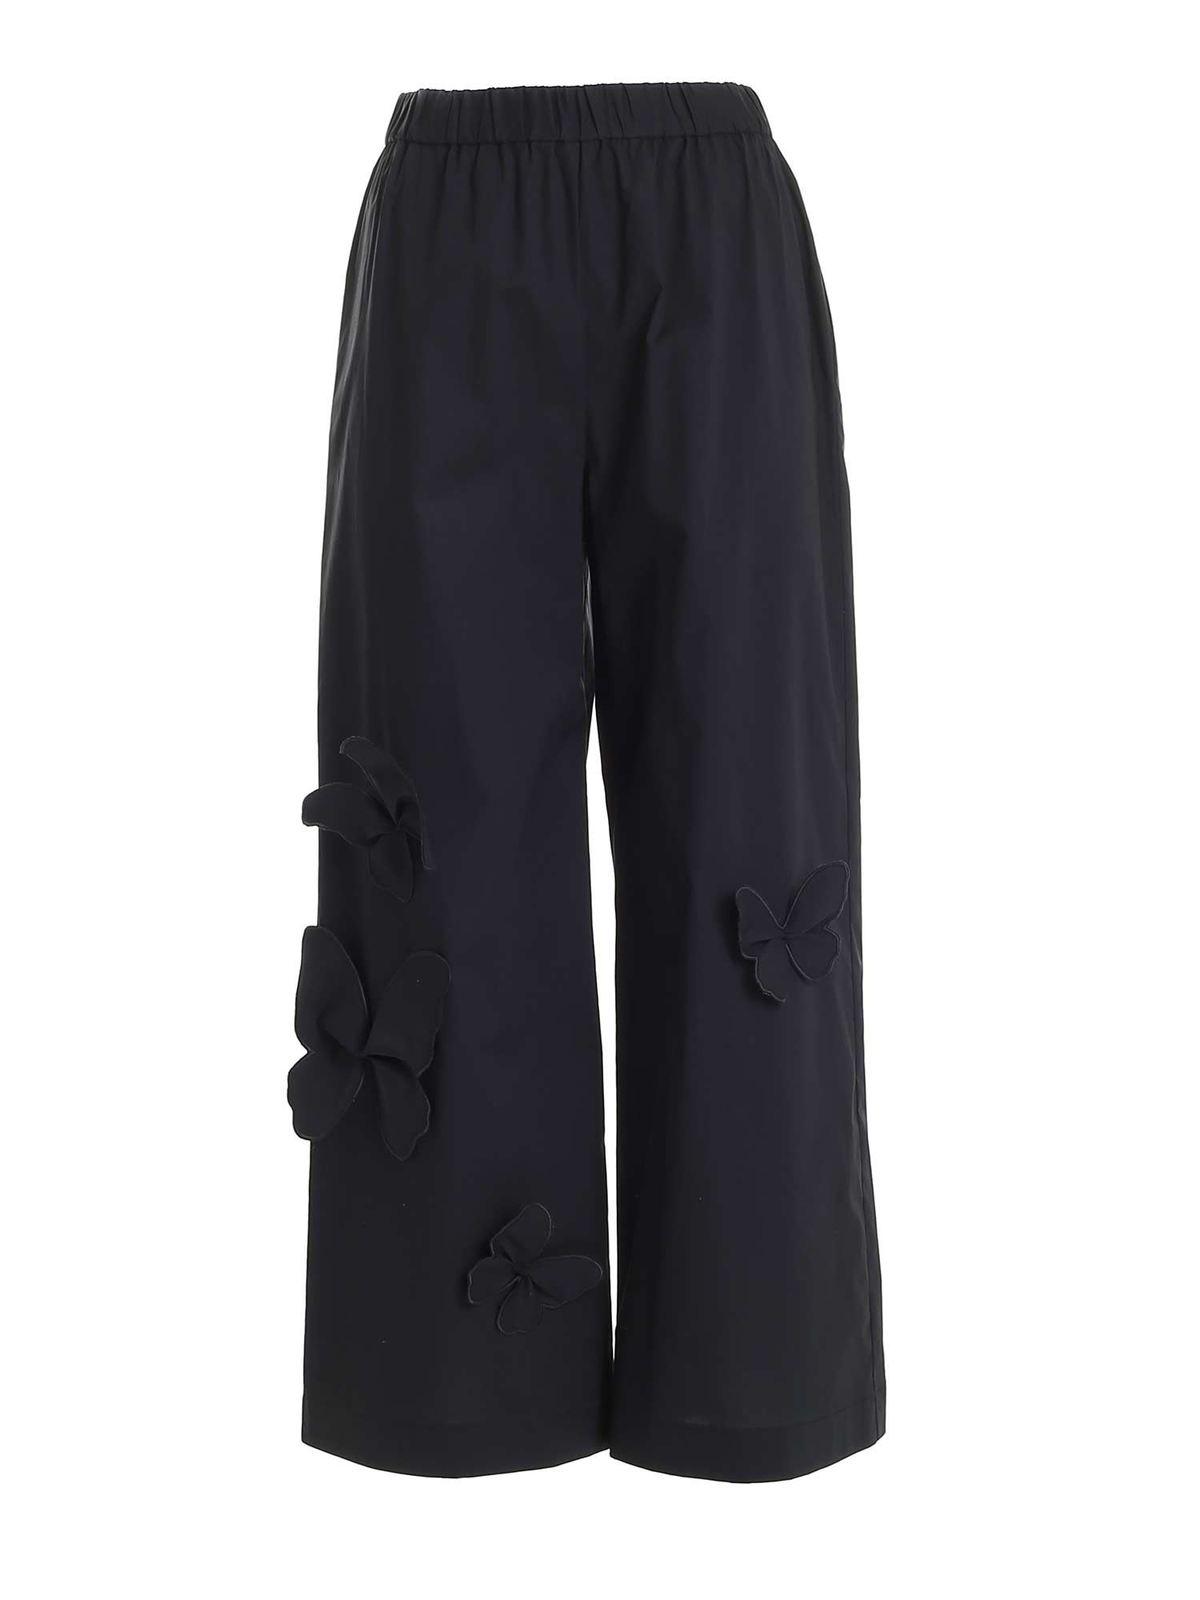 Vivetta BUTTERFLIES DETAILS PANTS IN BLACK